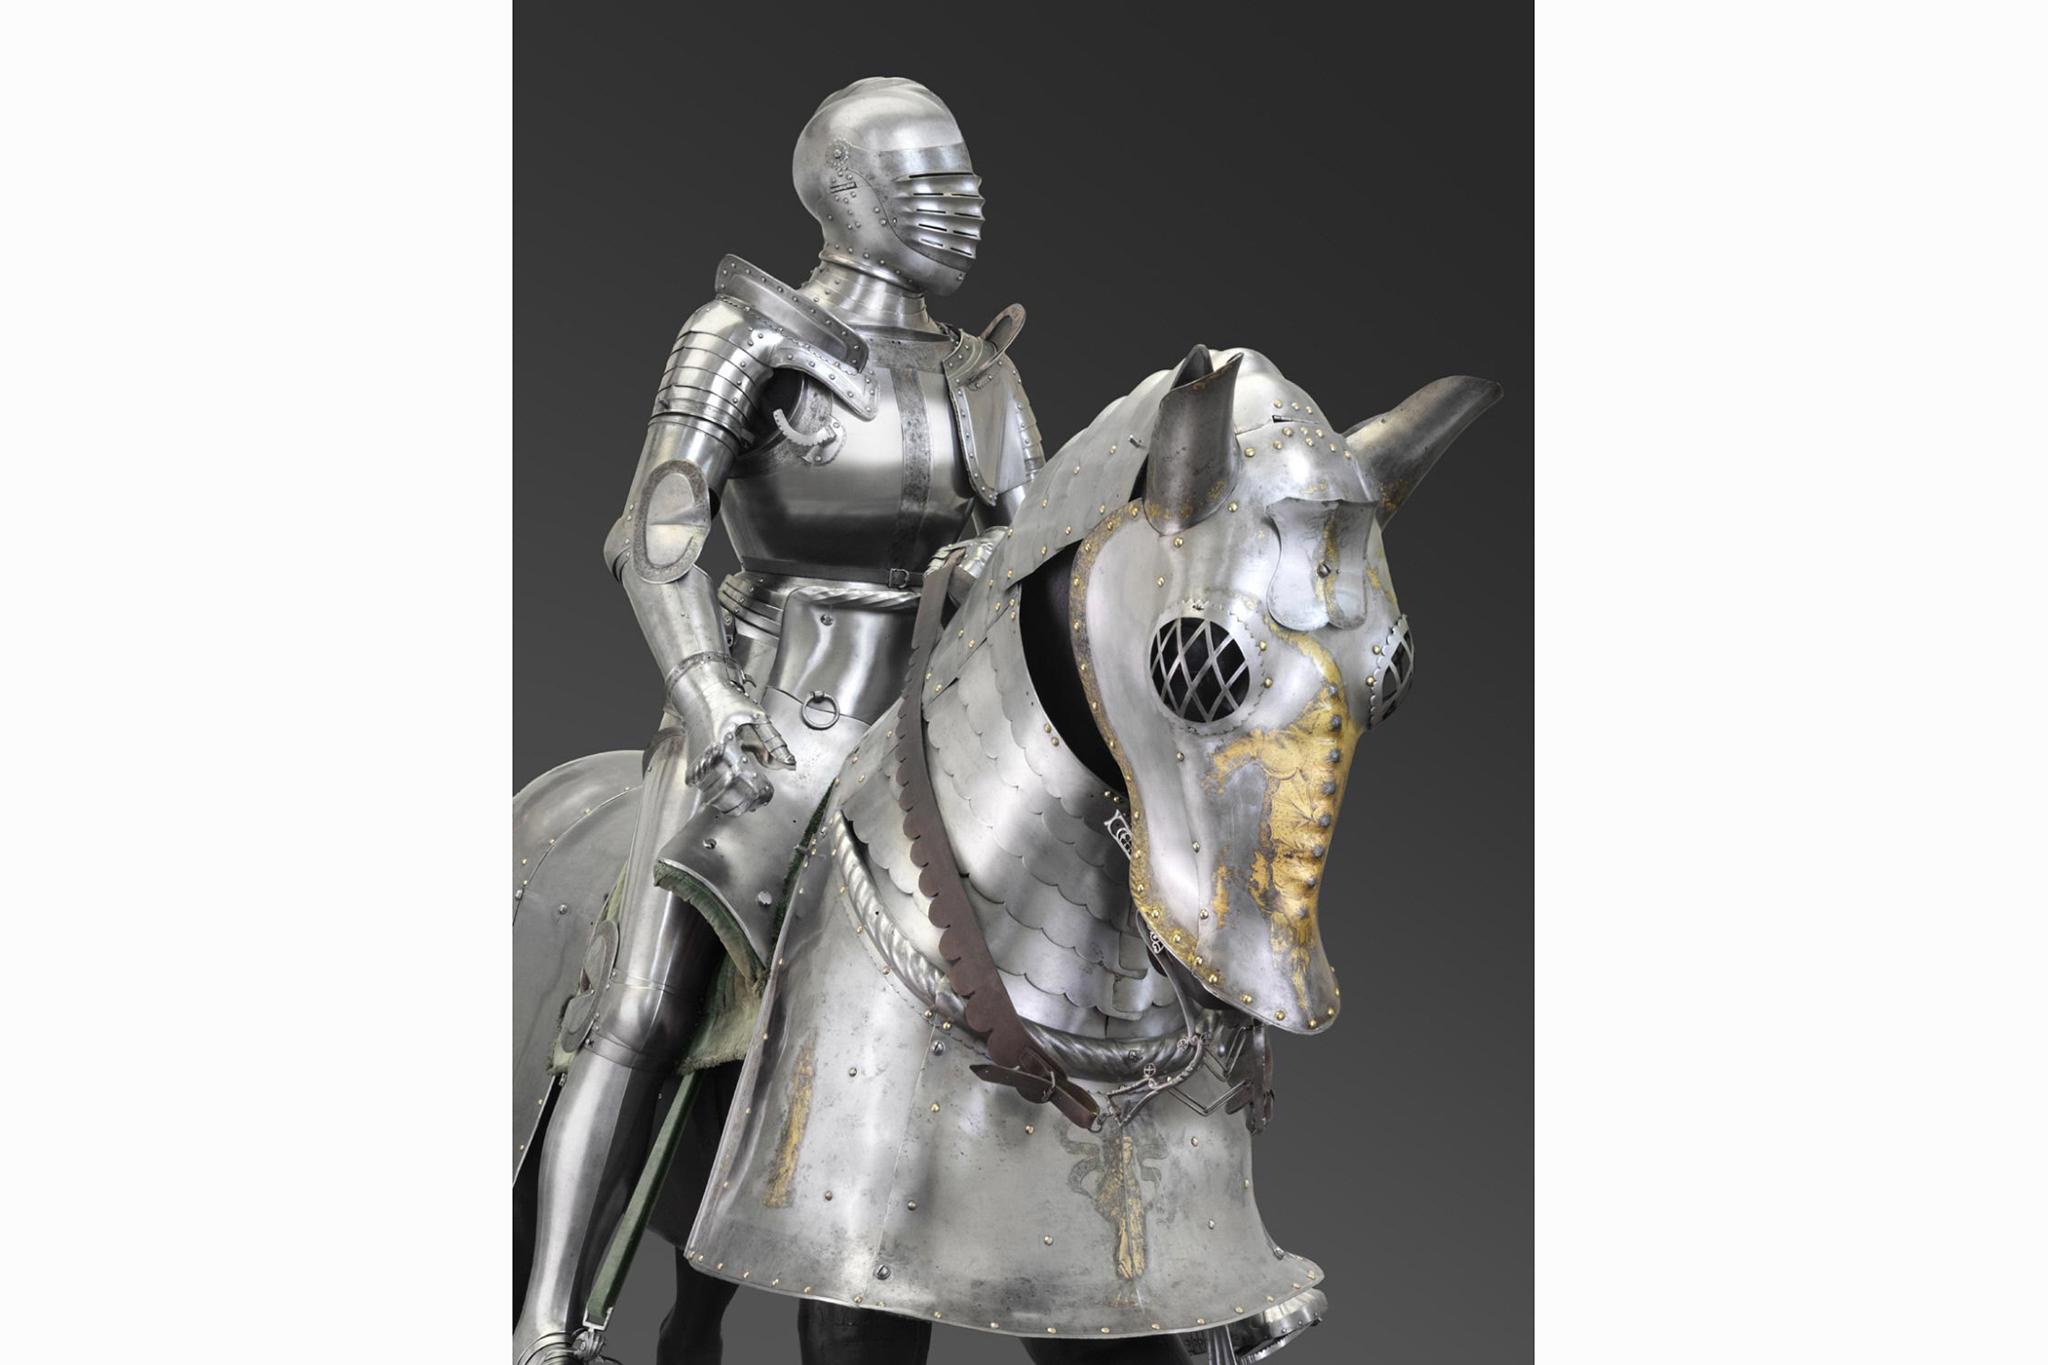 The Carl Otto Kretzschmar von Kienbusch Collection—arms and armor, @1300s-1700s